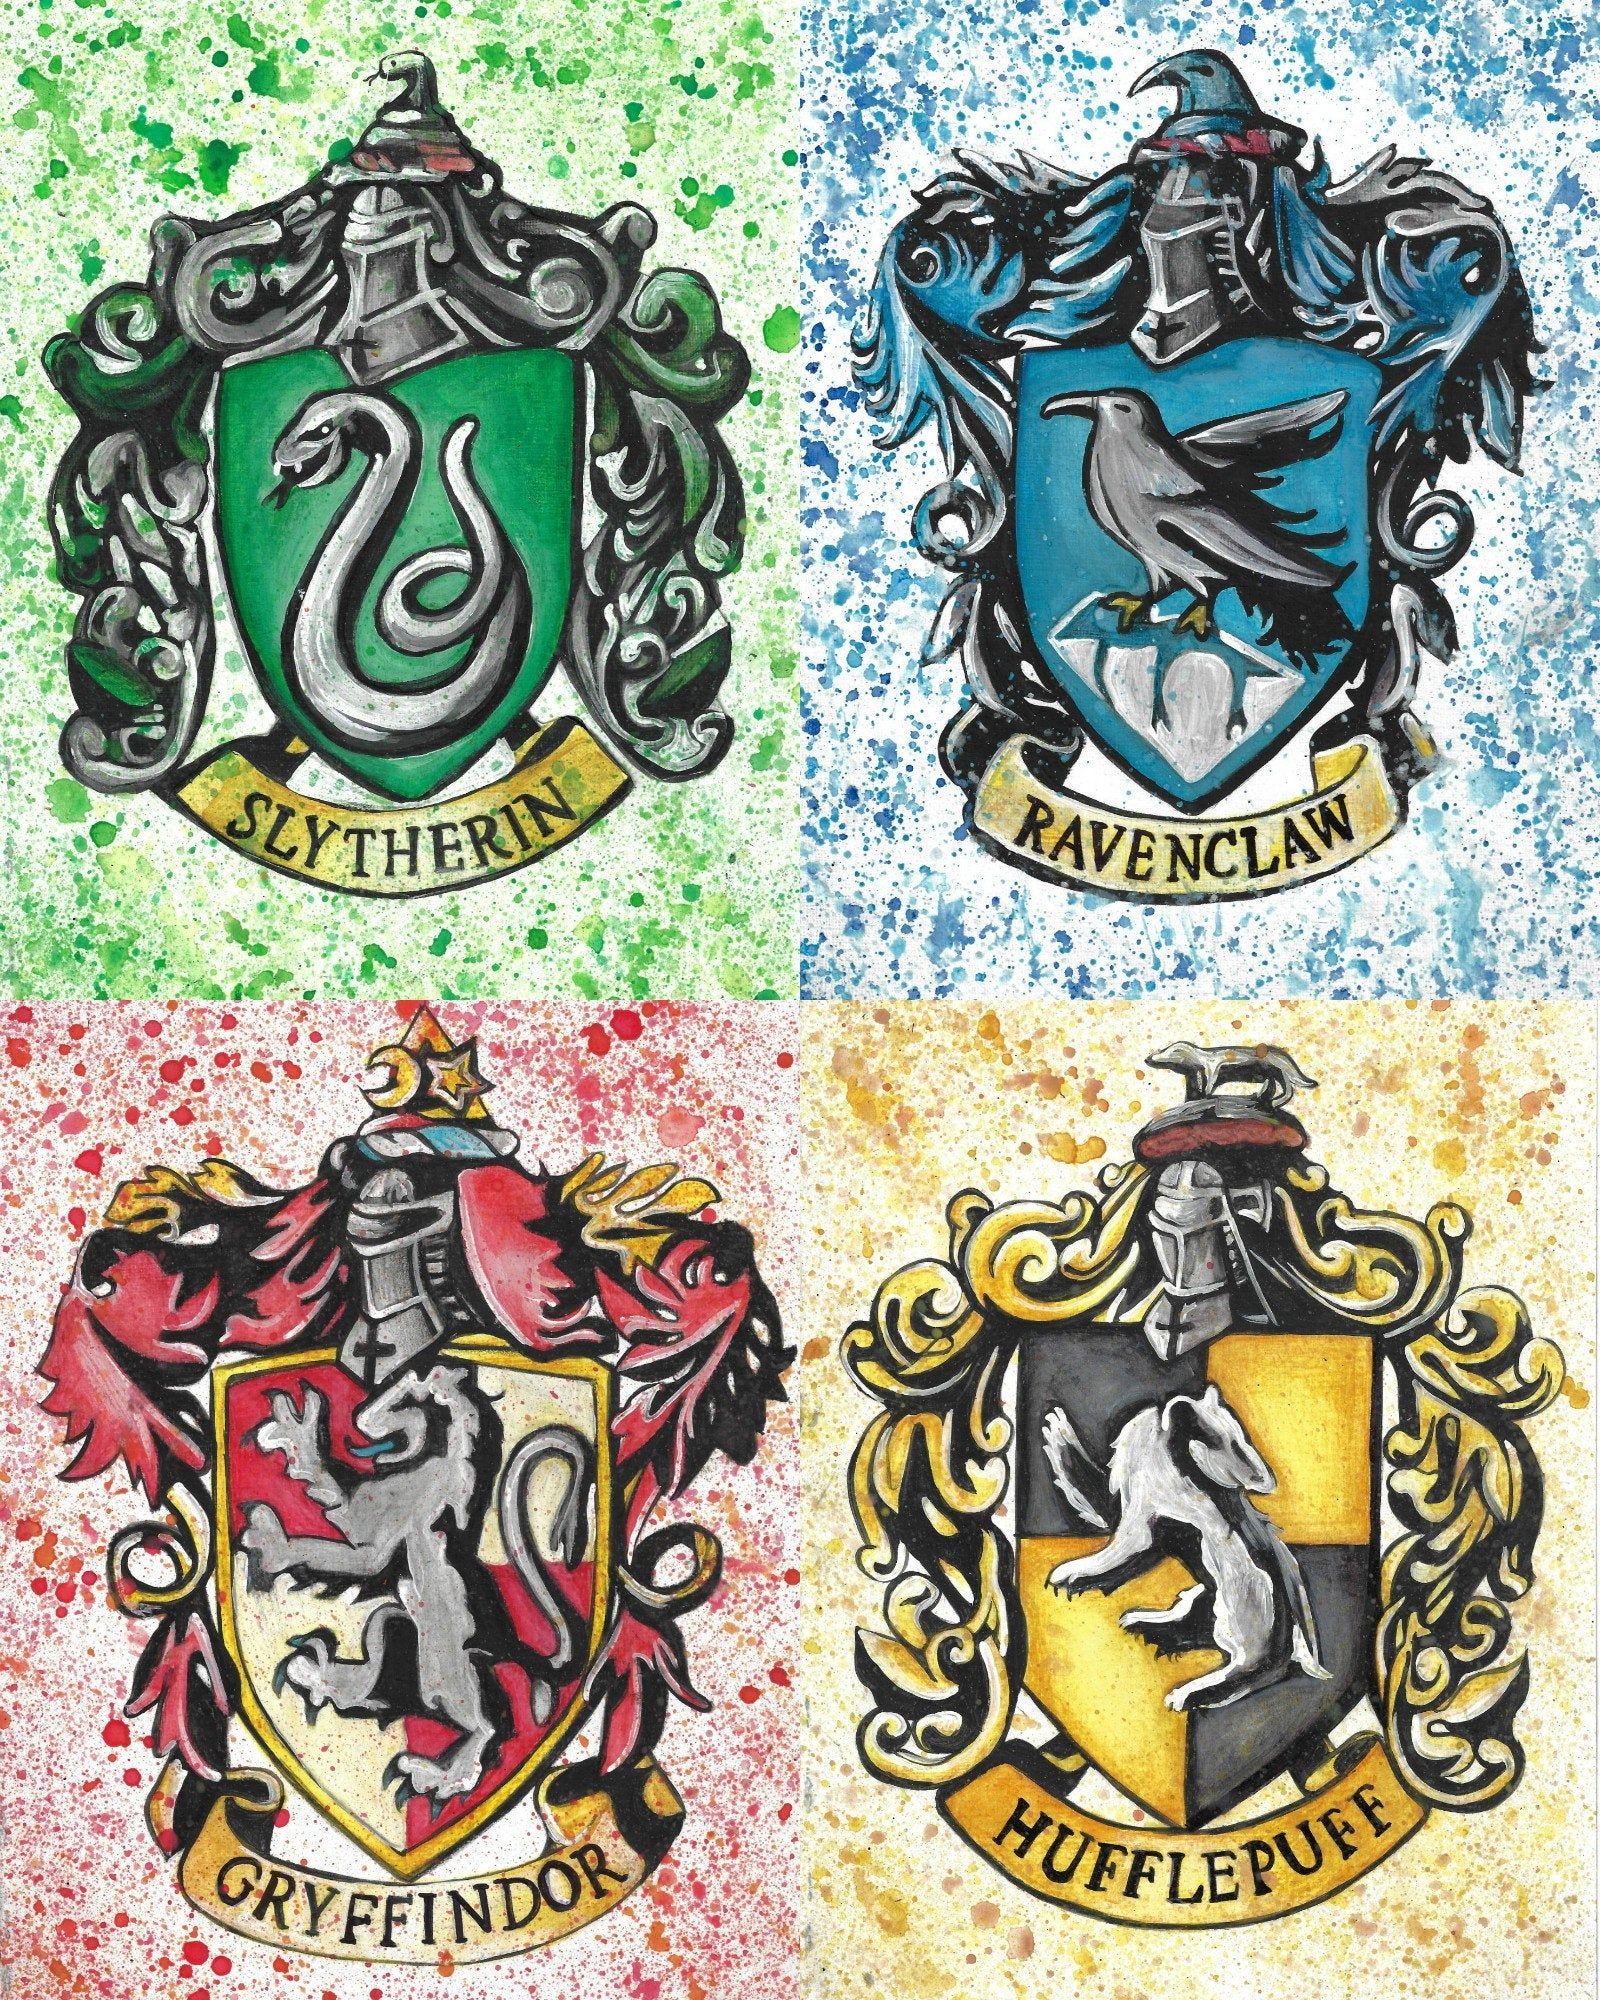 Harry Potter Hogwarts House Wall Art Print Gryffindor Etsy Harry Potter Logo Harry Potter Wallpaper Harry Potter Gryffindor Logo